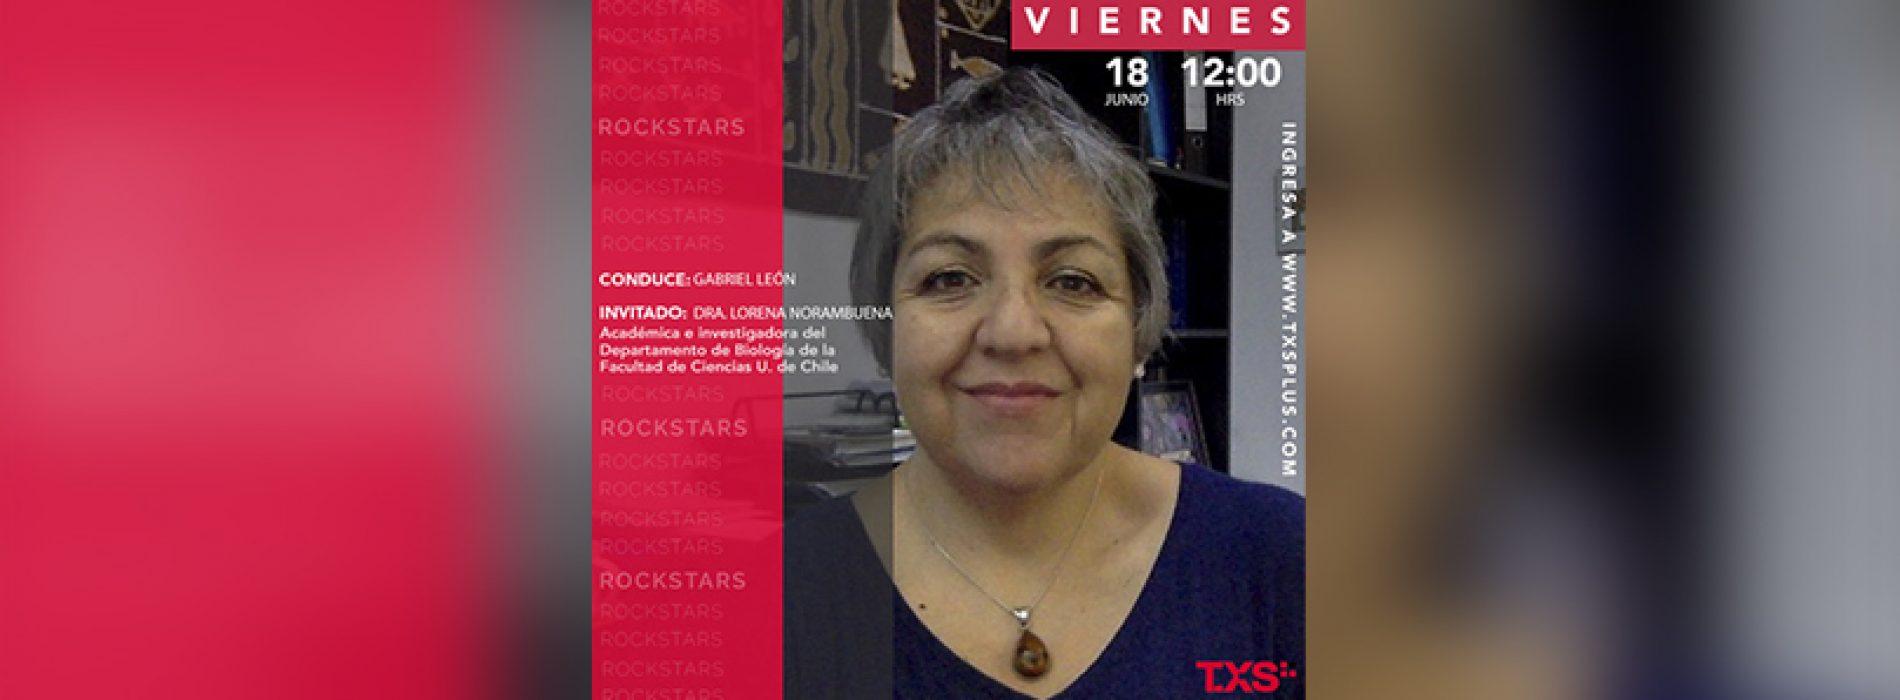 Entrevista a Dra Lorena Norambuena en programa Rock Stars de TXSPlus